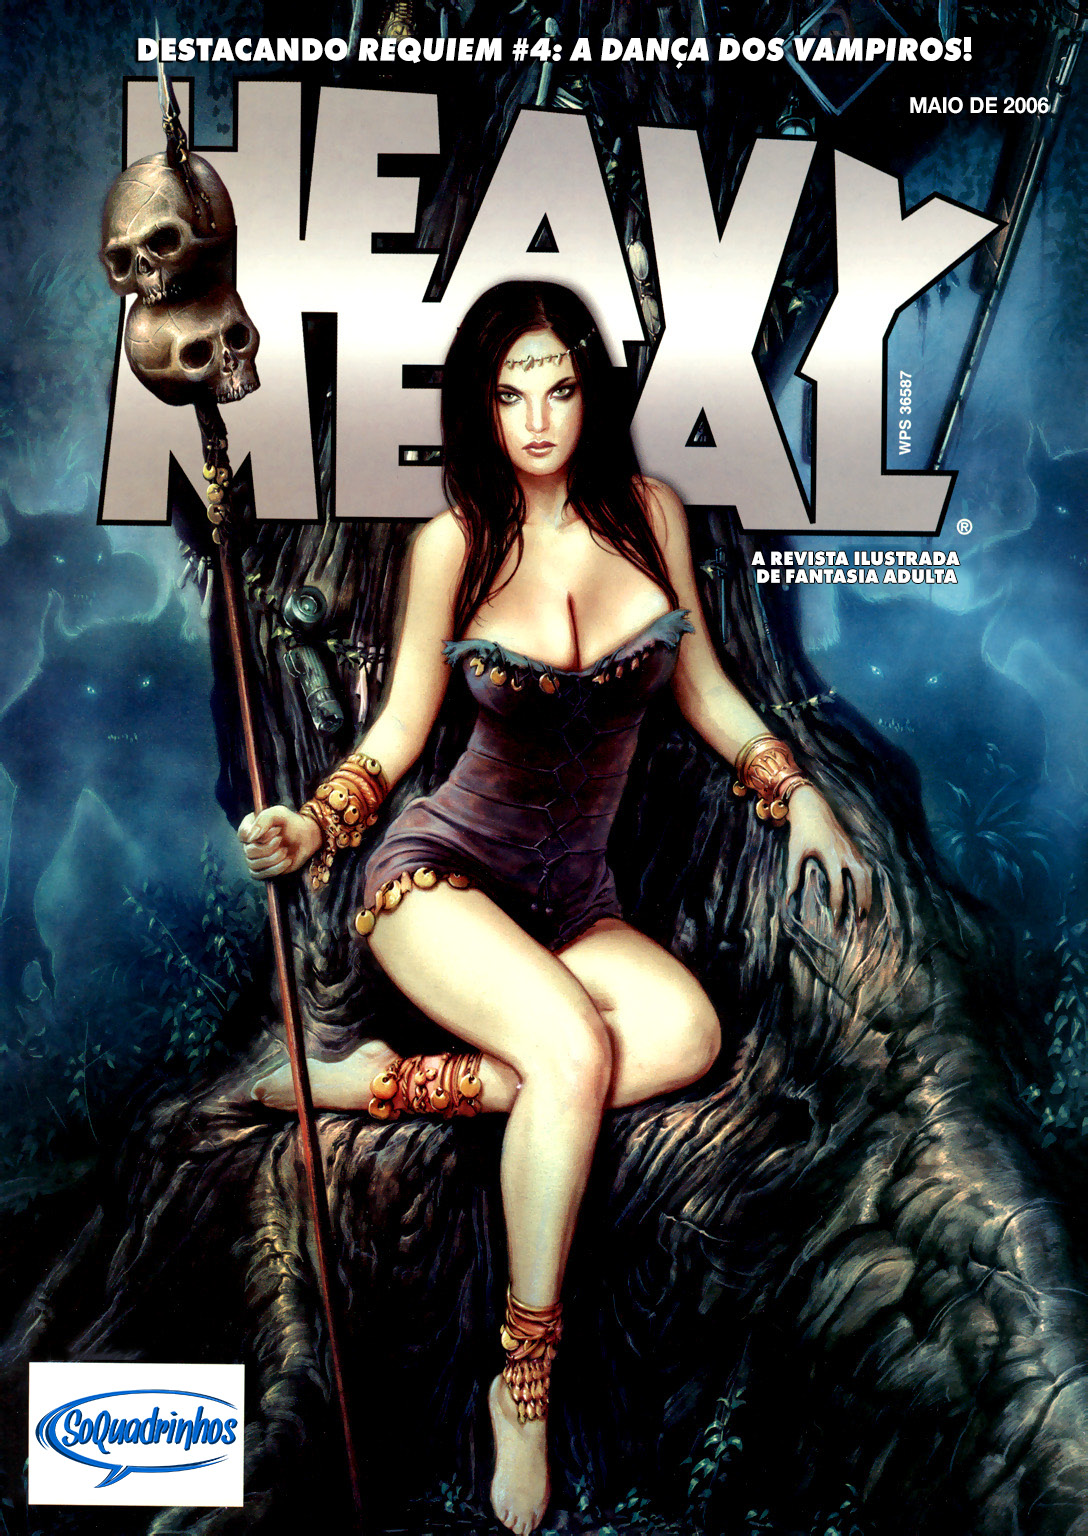 heavy-metal-dating-site